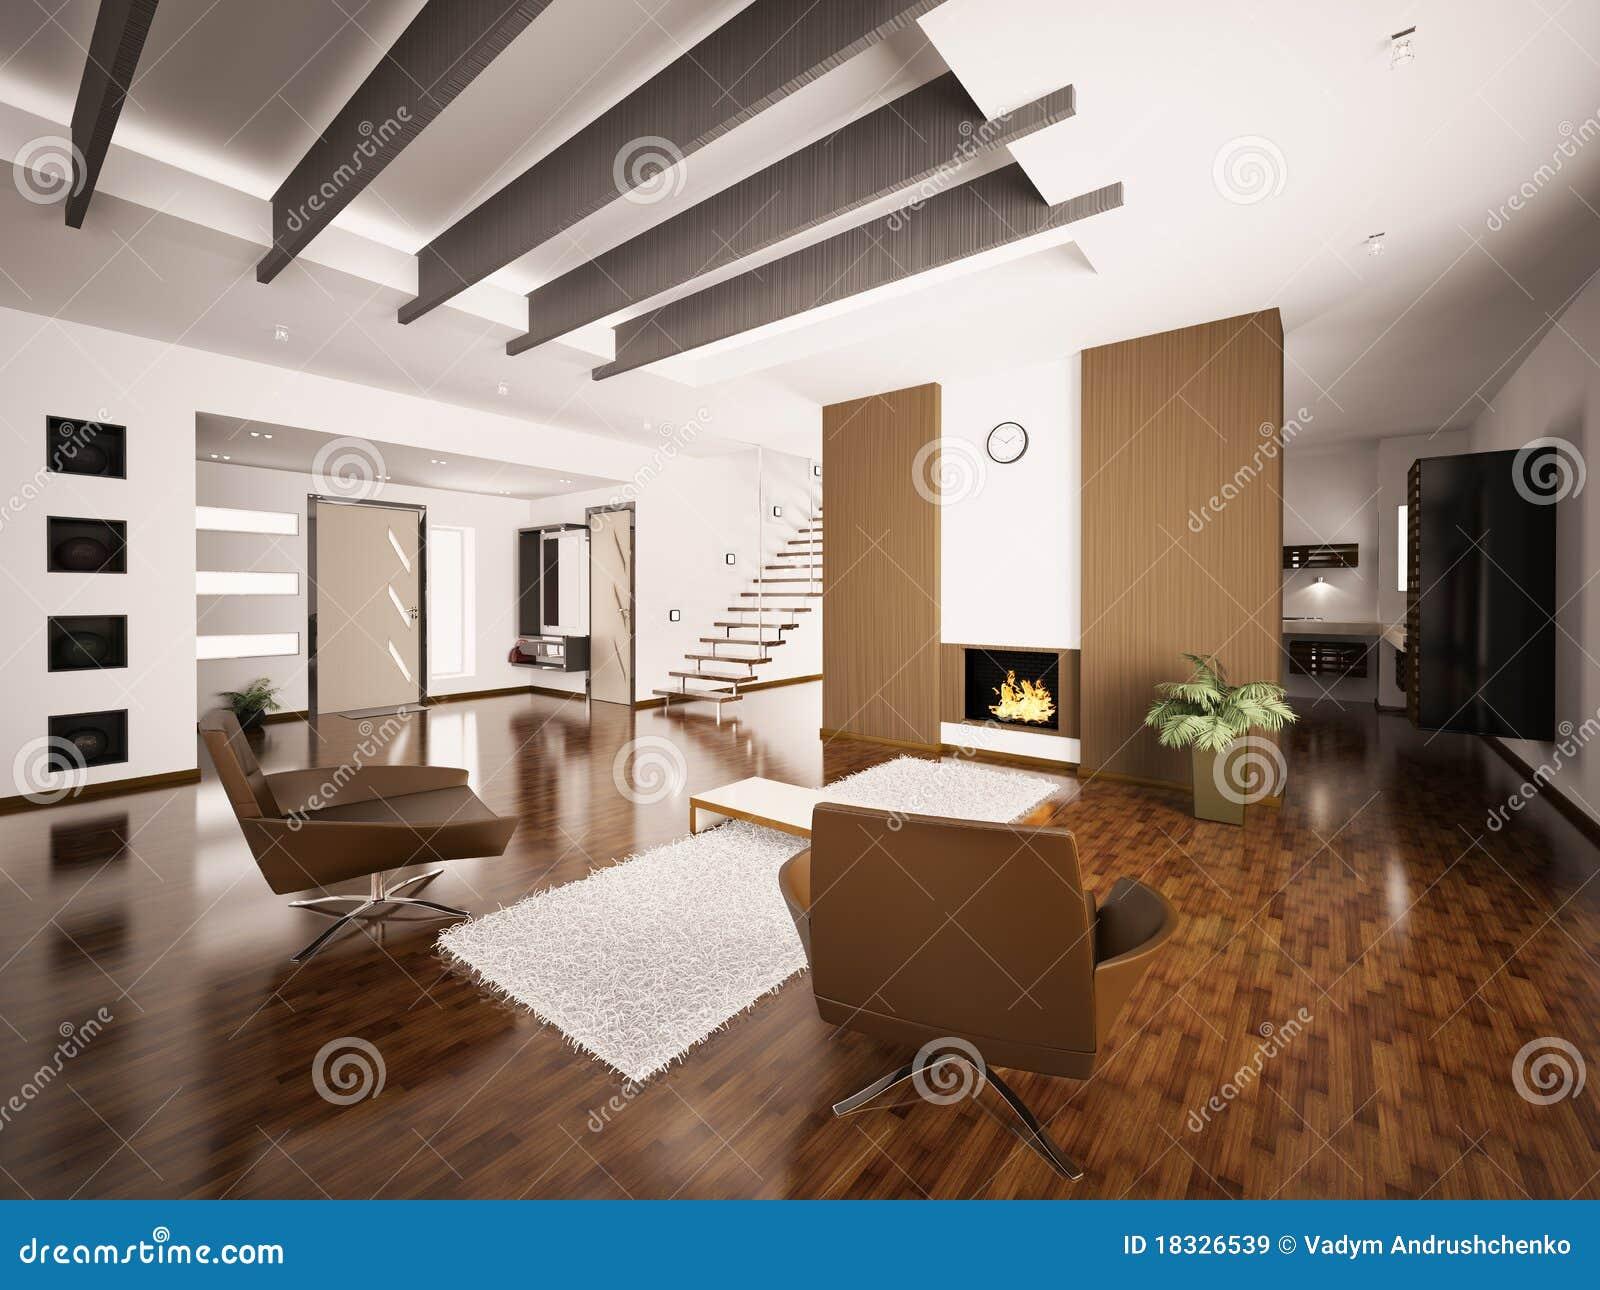 L 39 appartamento moderno 3d interno rende immagini stock for Immagini di appartamenti moderni